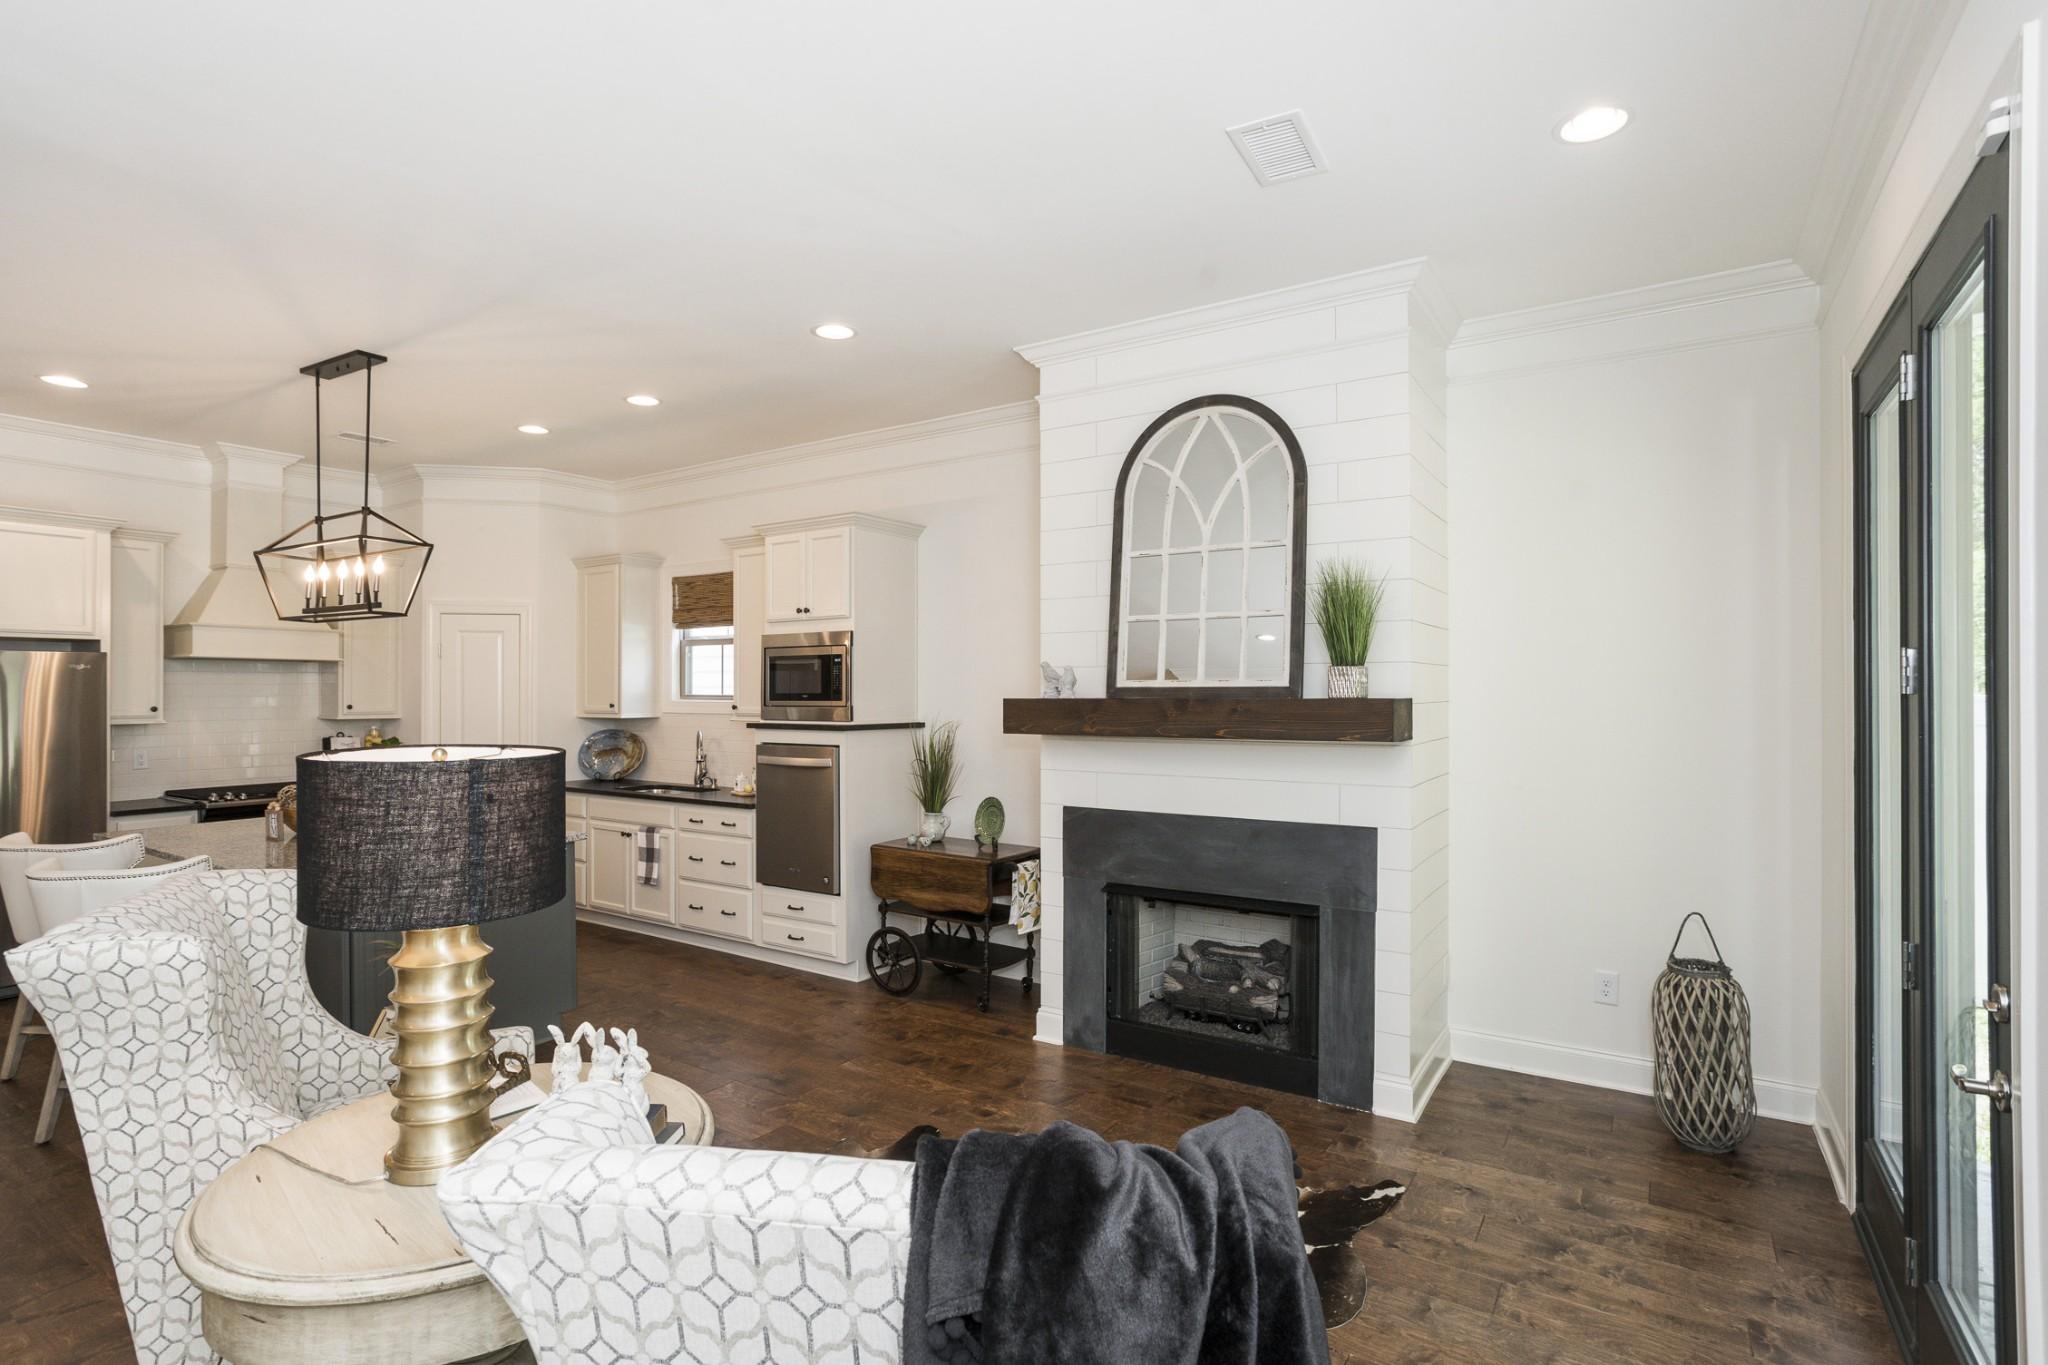 3515 Cortona Way, Murfreesboro, TN 37129 - Murfreesboro, TN real estate listing